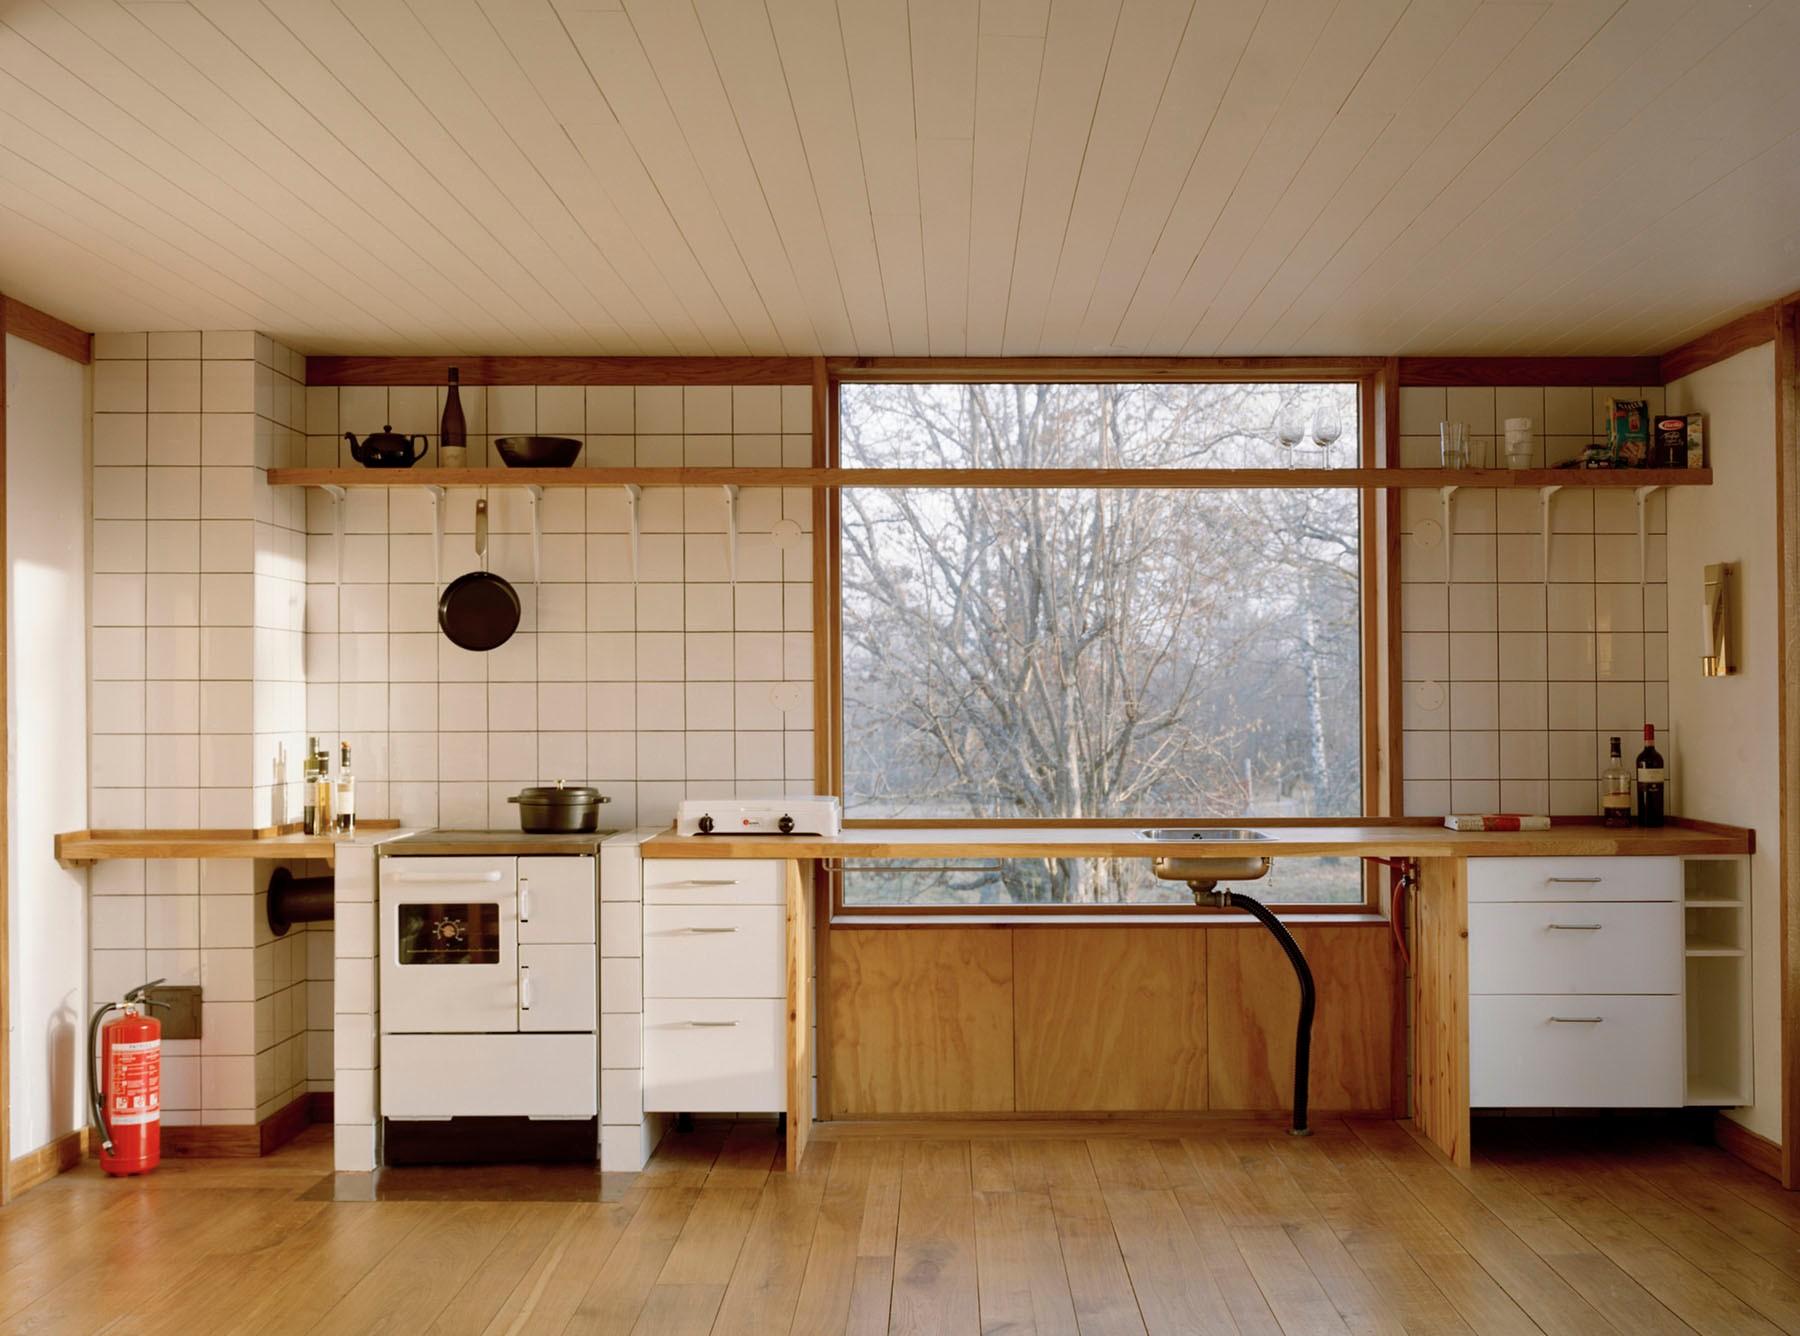 thisispaper-general-architecture-sweden-nannberga-photo-mikael-olsson_7.jpg